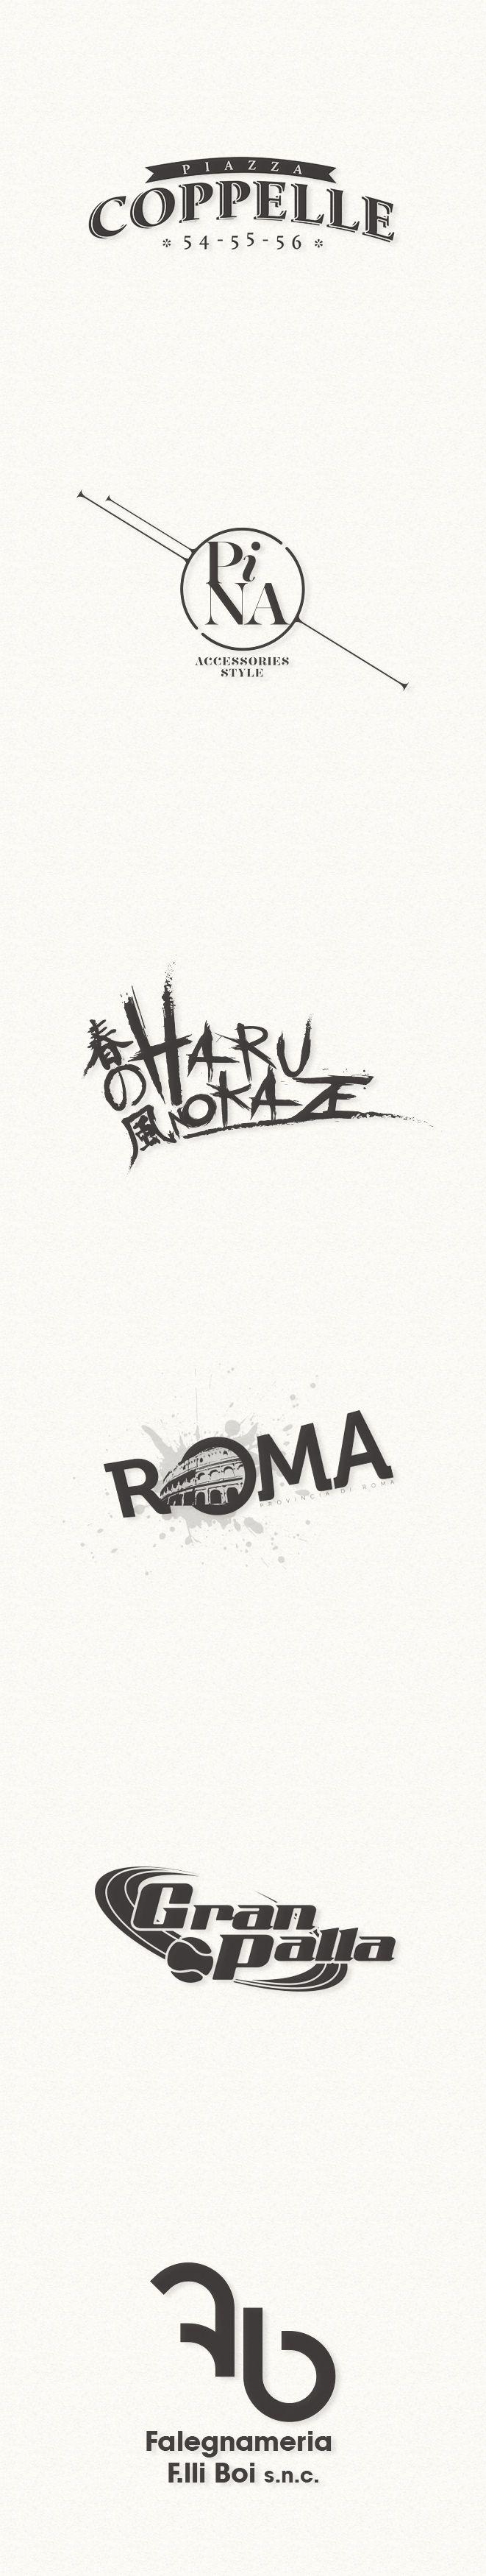 SIMONE BOI | GRAPHIC DESIGNER Loghi www.simoneboi.it